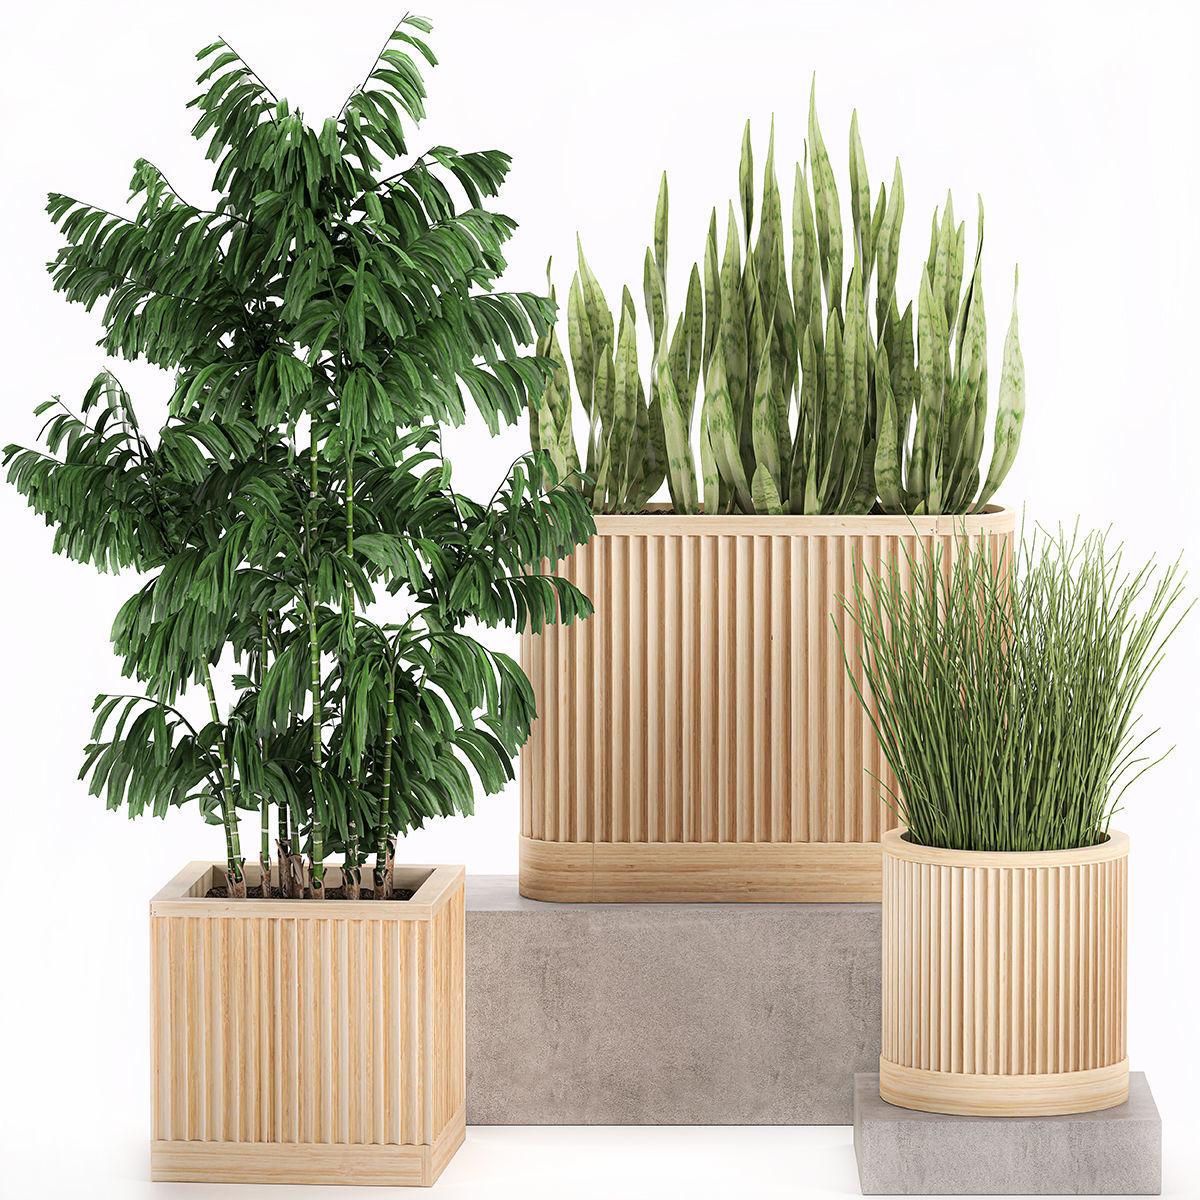 Decorative plants in a bamboo flowerpots 799